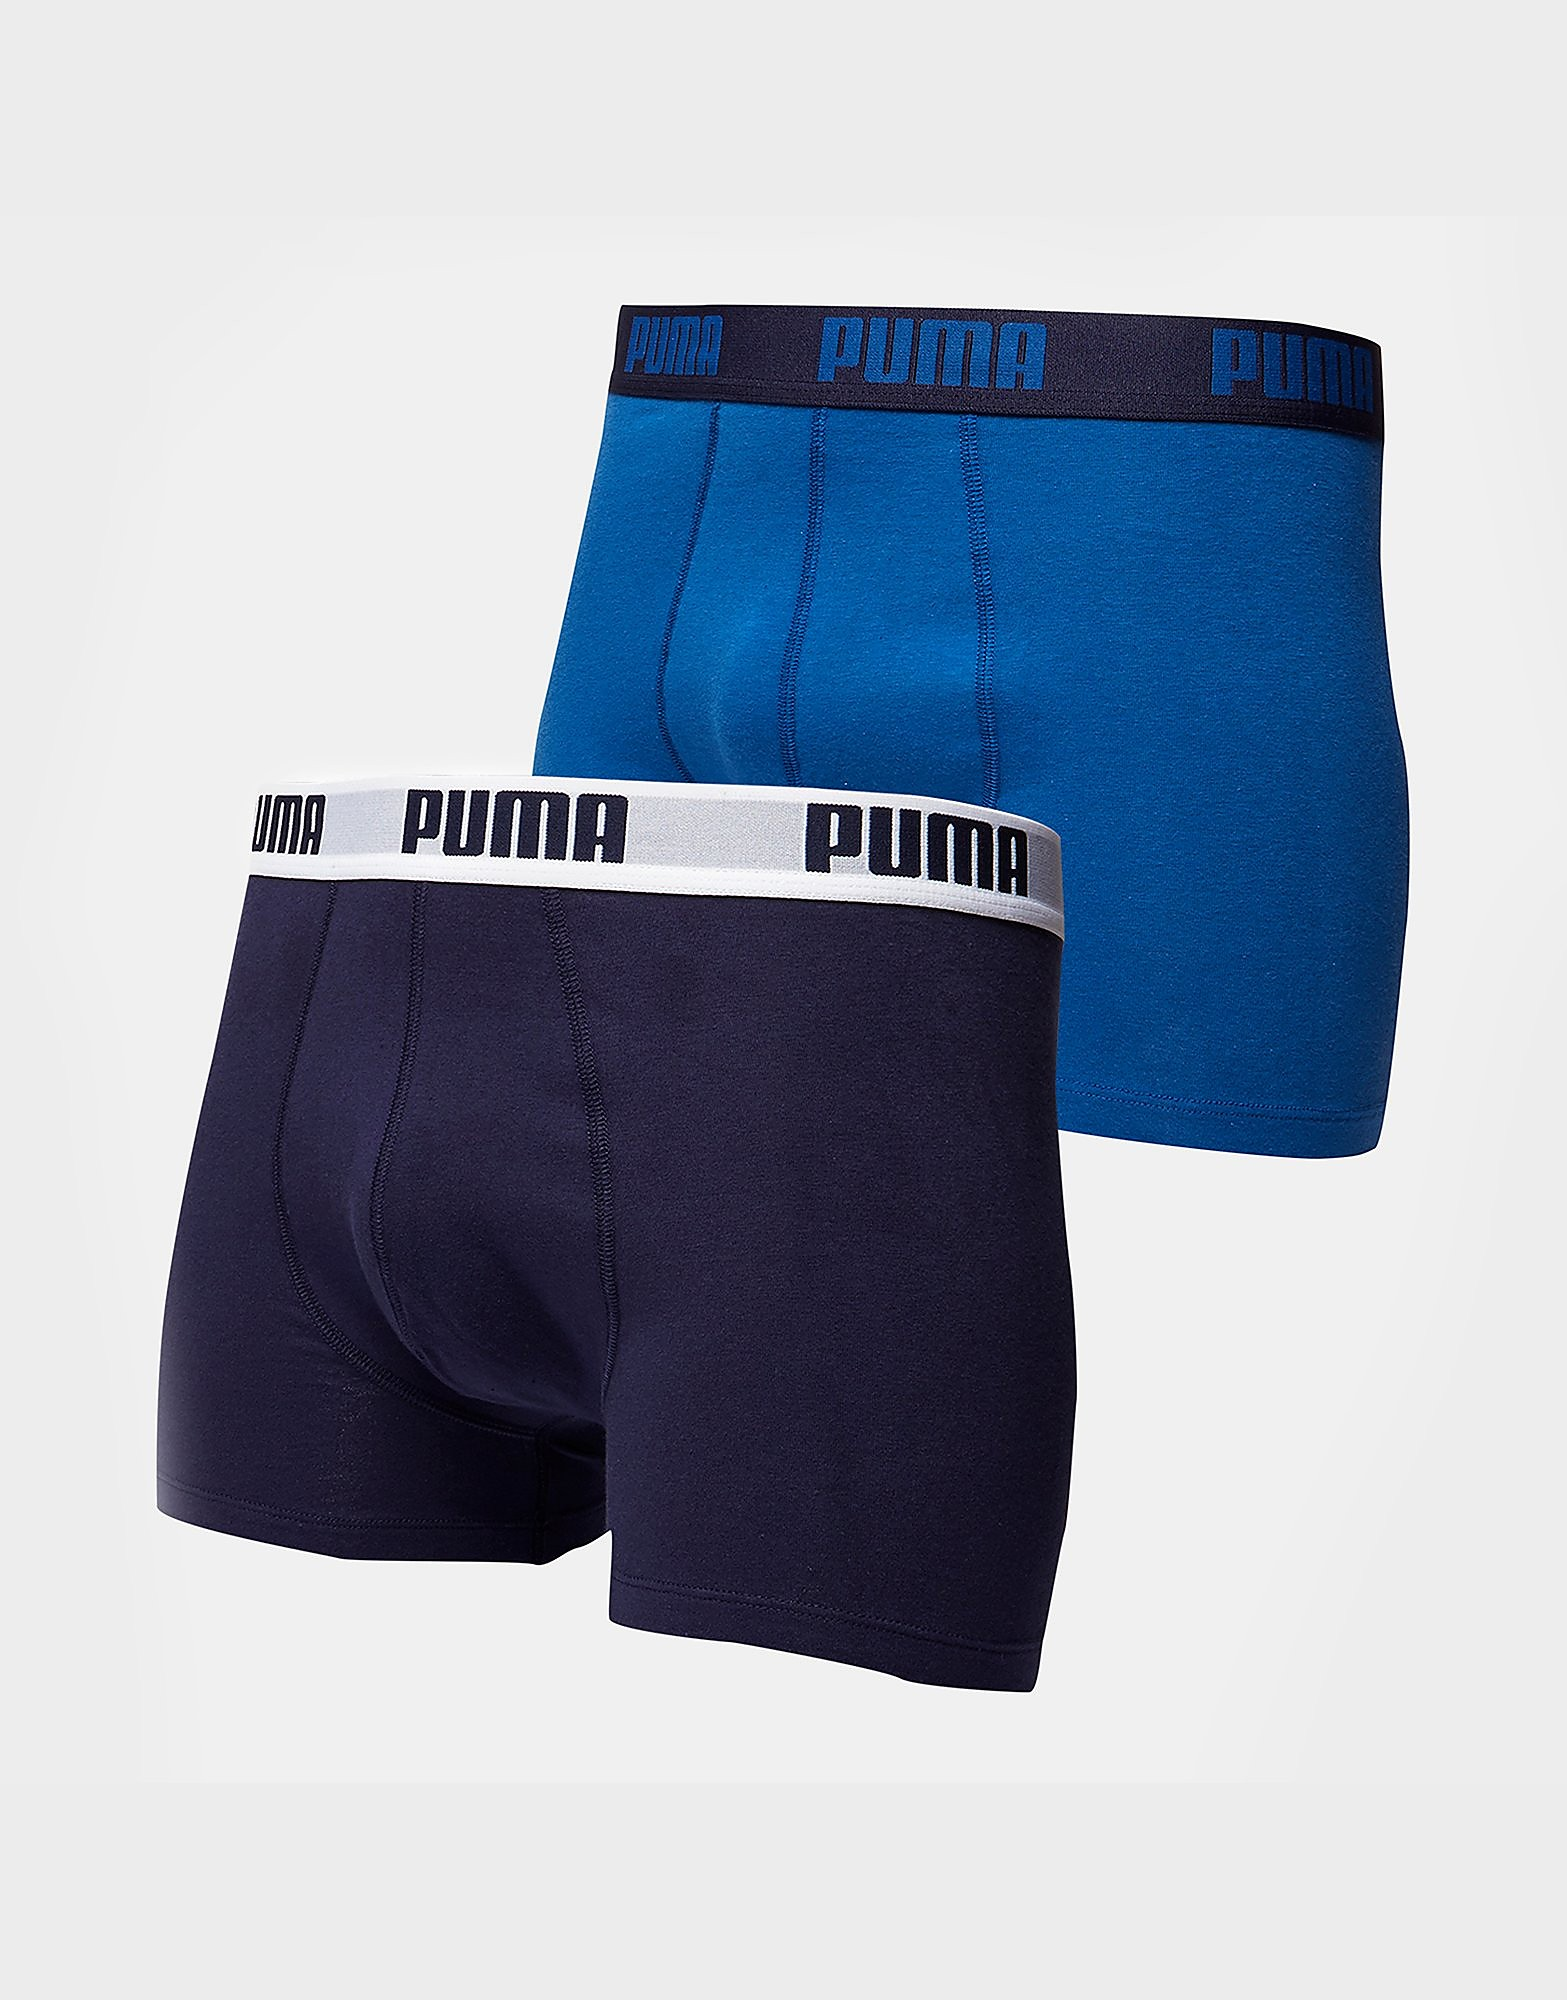 PUMA 2 Pack Boxers